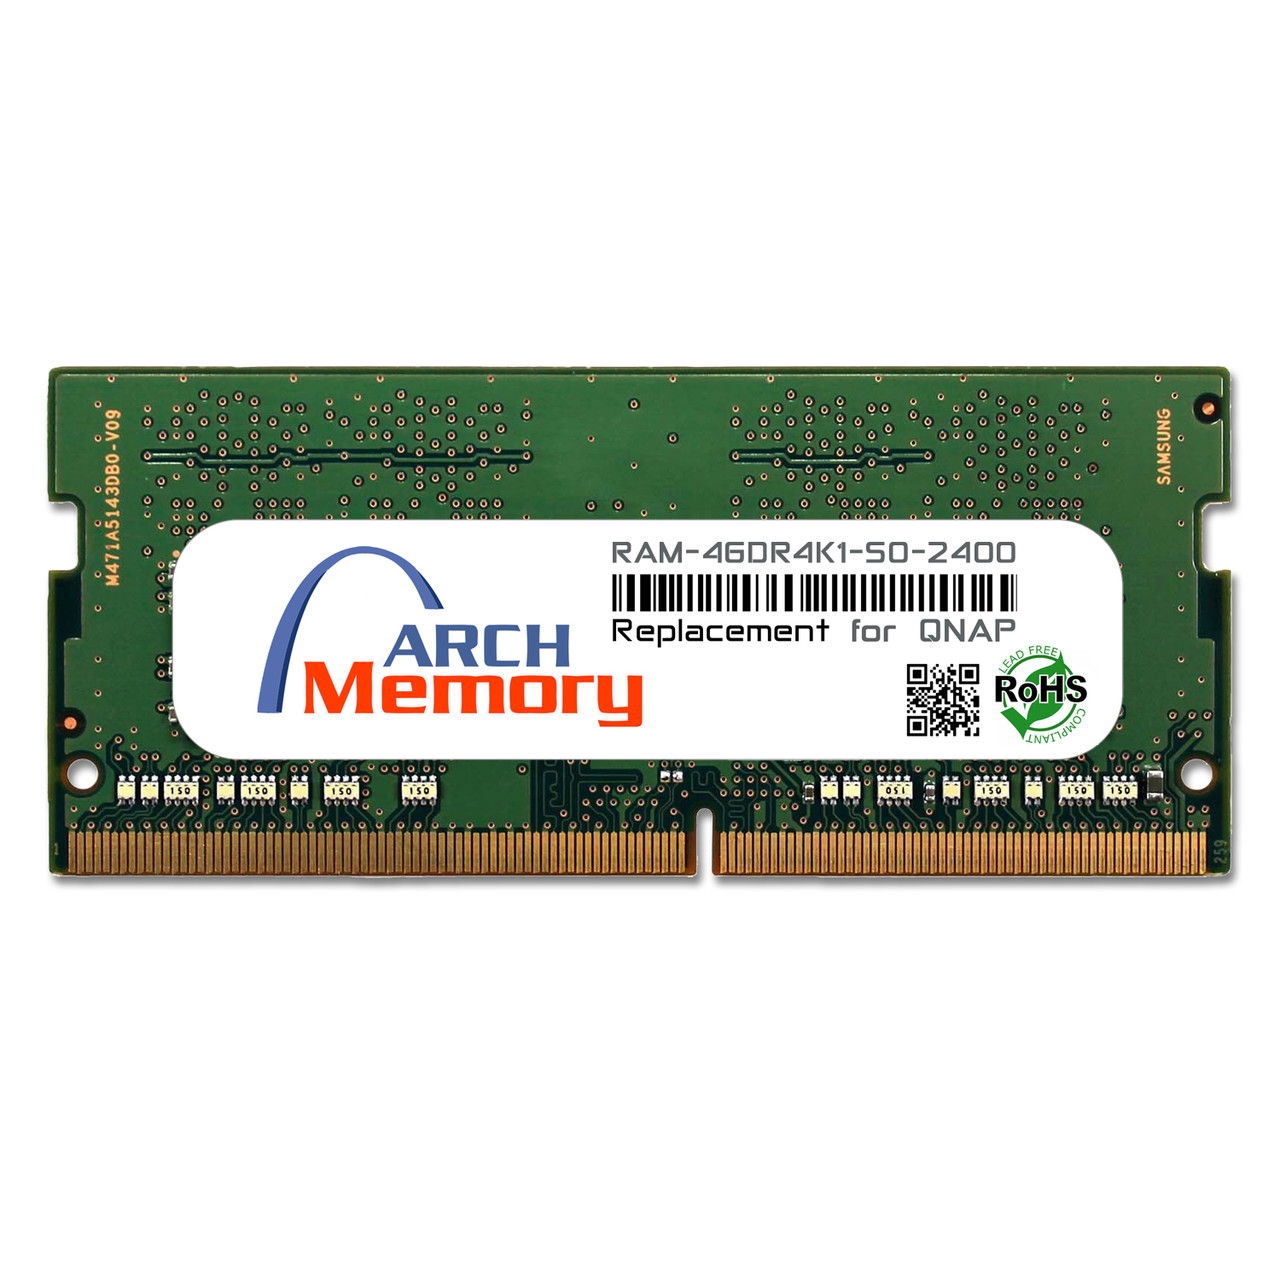 4GB RAM-4GDR4K1-SO-2400 DDR4-2400 PC4-19200 260-Pin SODIMM RAM K1 Version | Memory for QNAP